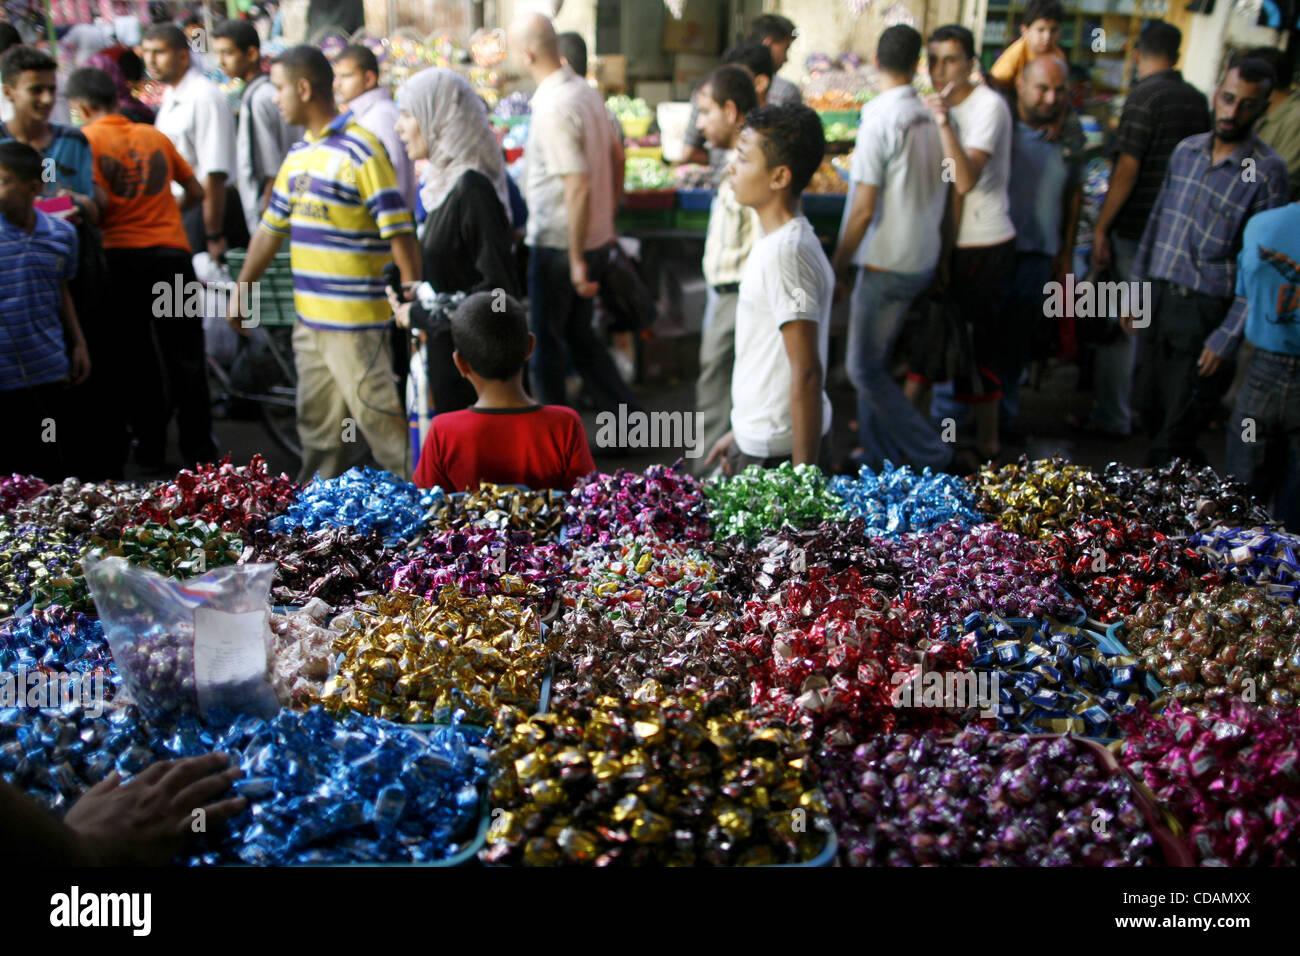 Amazing Gaza Eid Al-Fitr Feast - sep-09-2010-gaza-city-gaza-strip-palestinians-make-preparation-for-CDAMXX  Snapshot_32525 .jpg